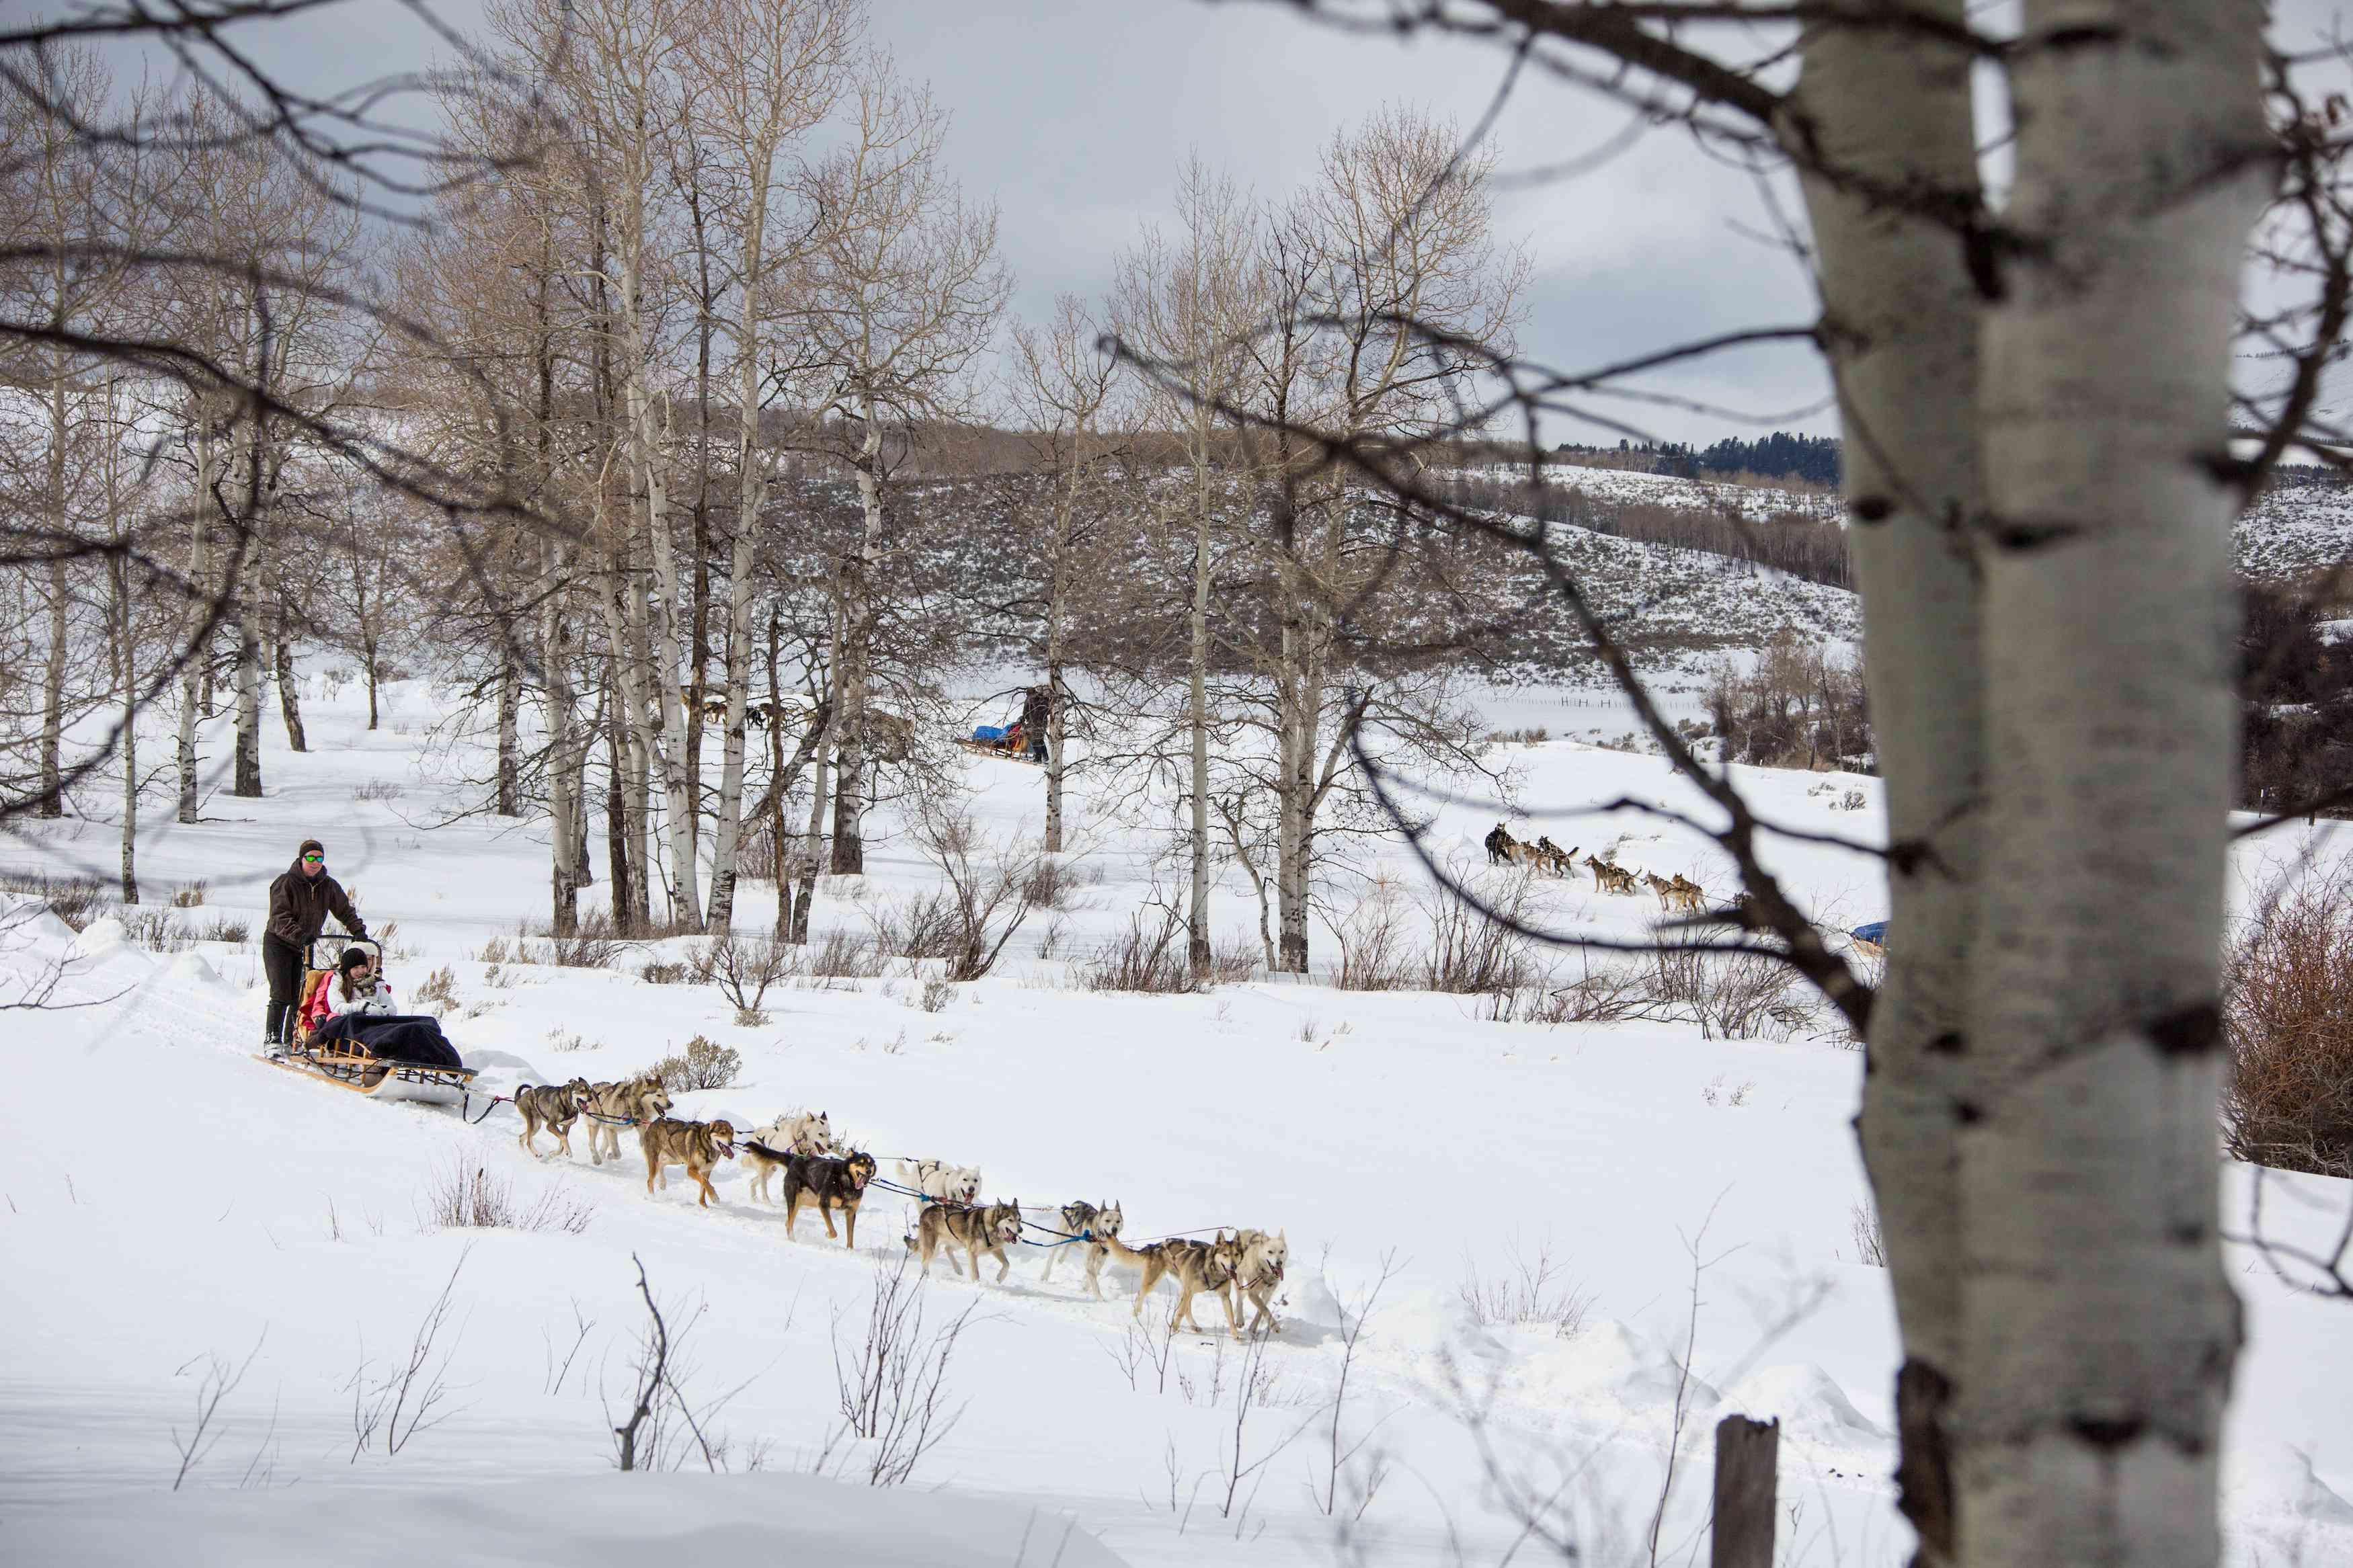 Dog sledding in Colorado